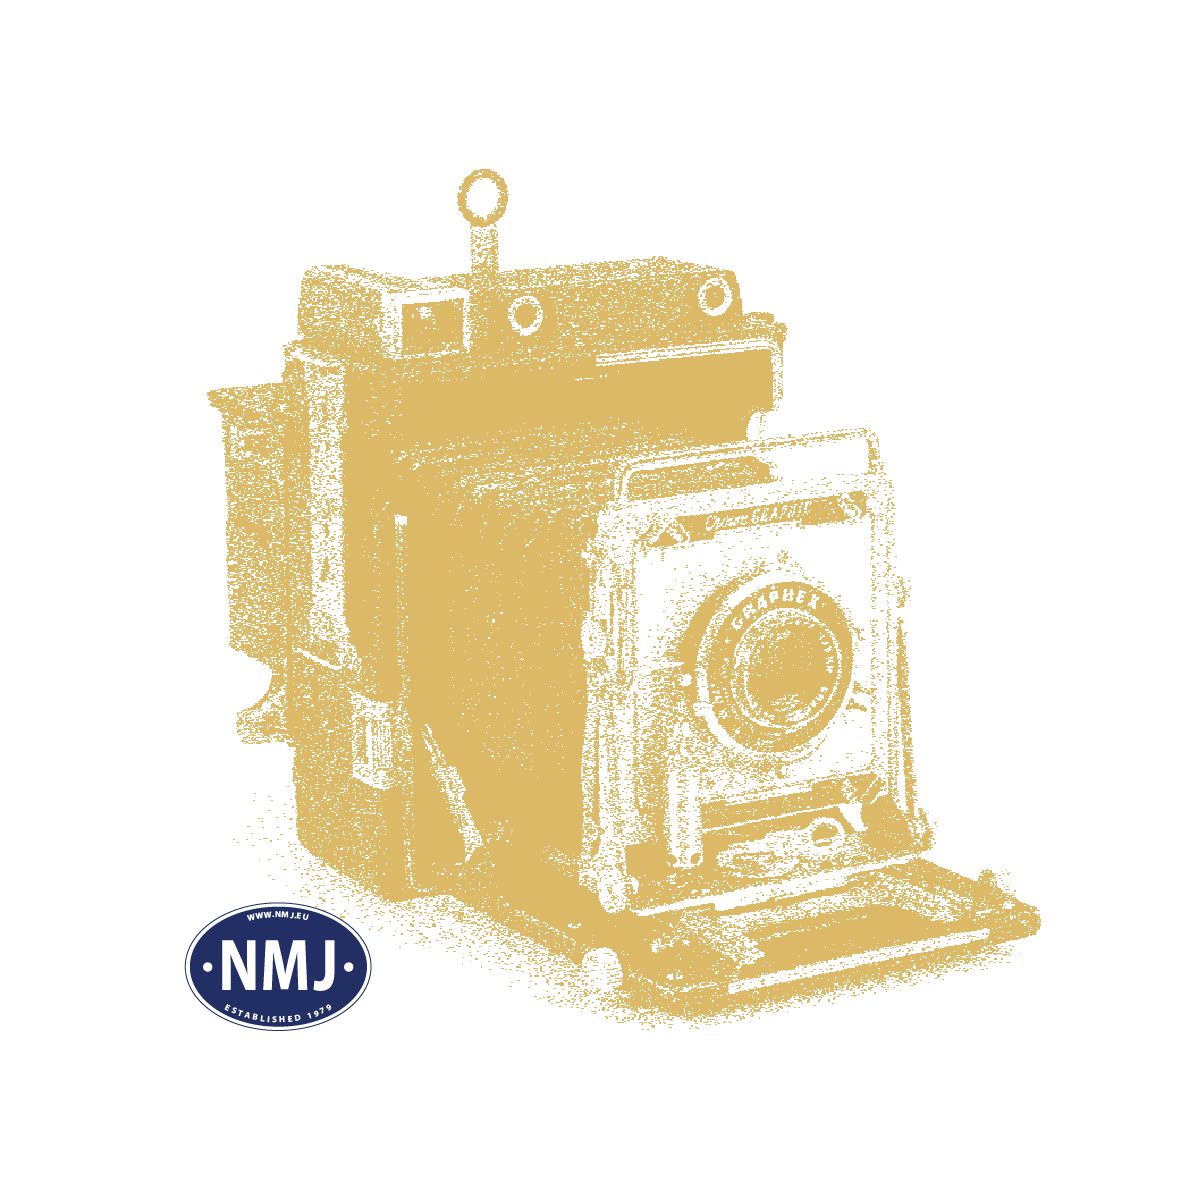 NMJT86.201 - NMJ Topline NSB El11.2107, rotbraun, DC